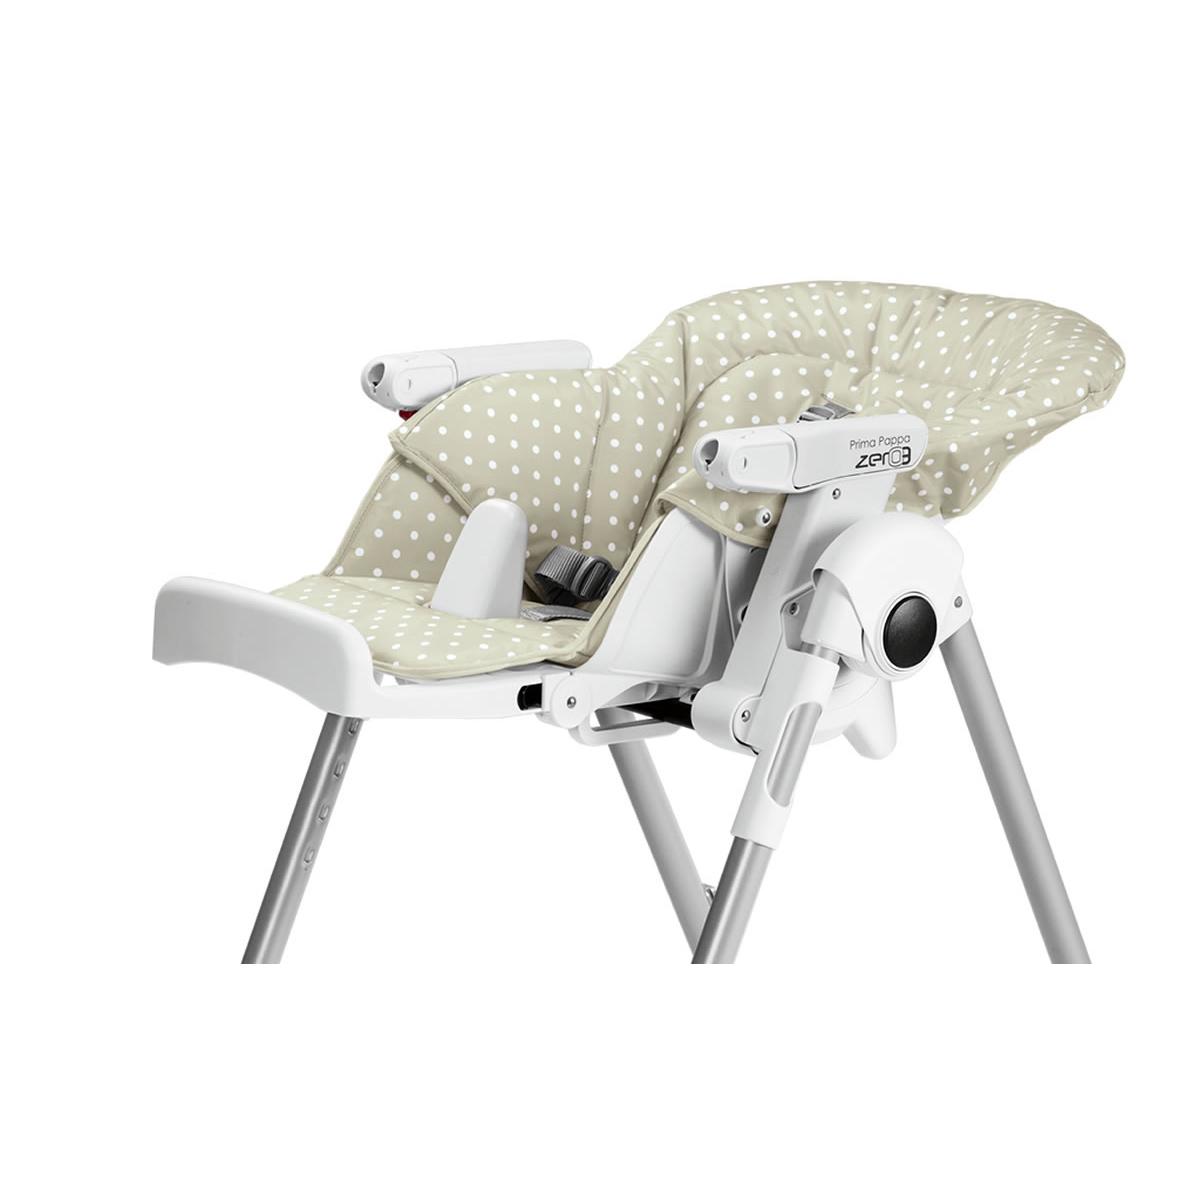 Peg p rego chaise prima pappa zero 3 baby dot beige for Acheter chaise haute